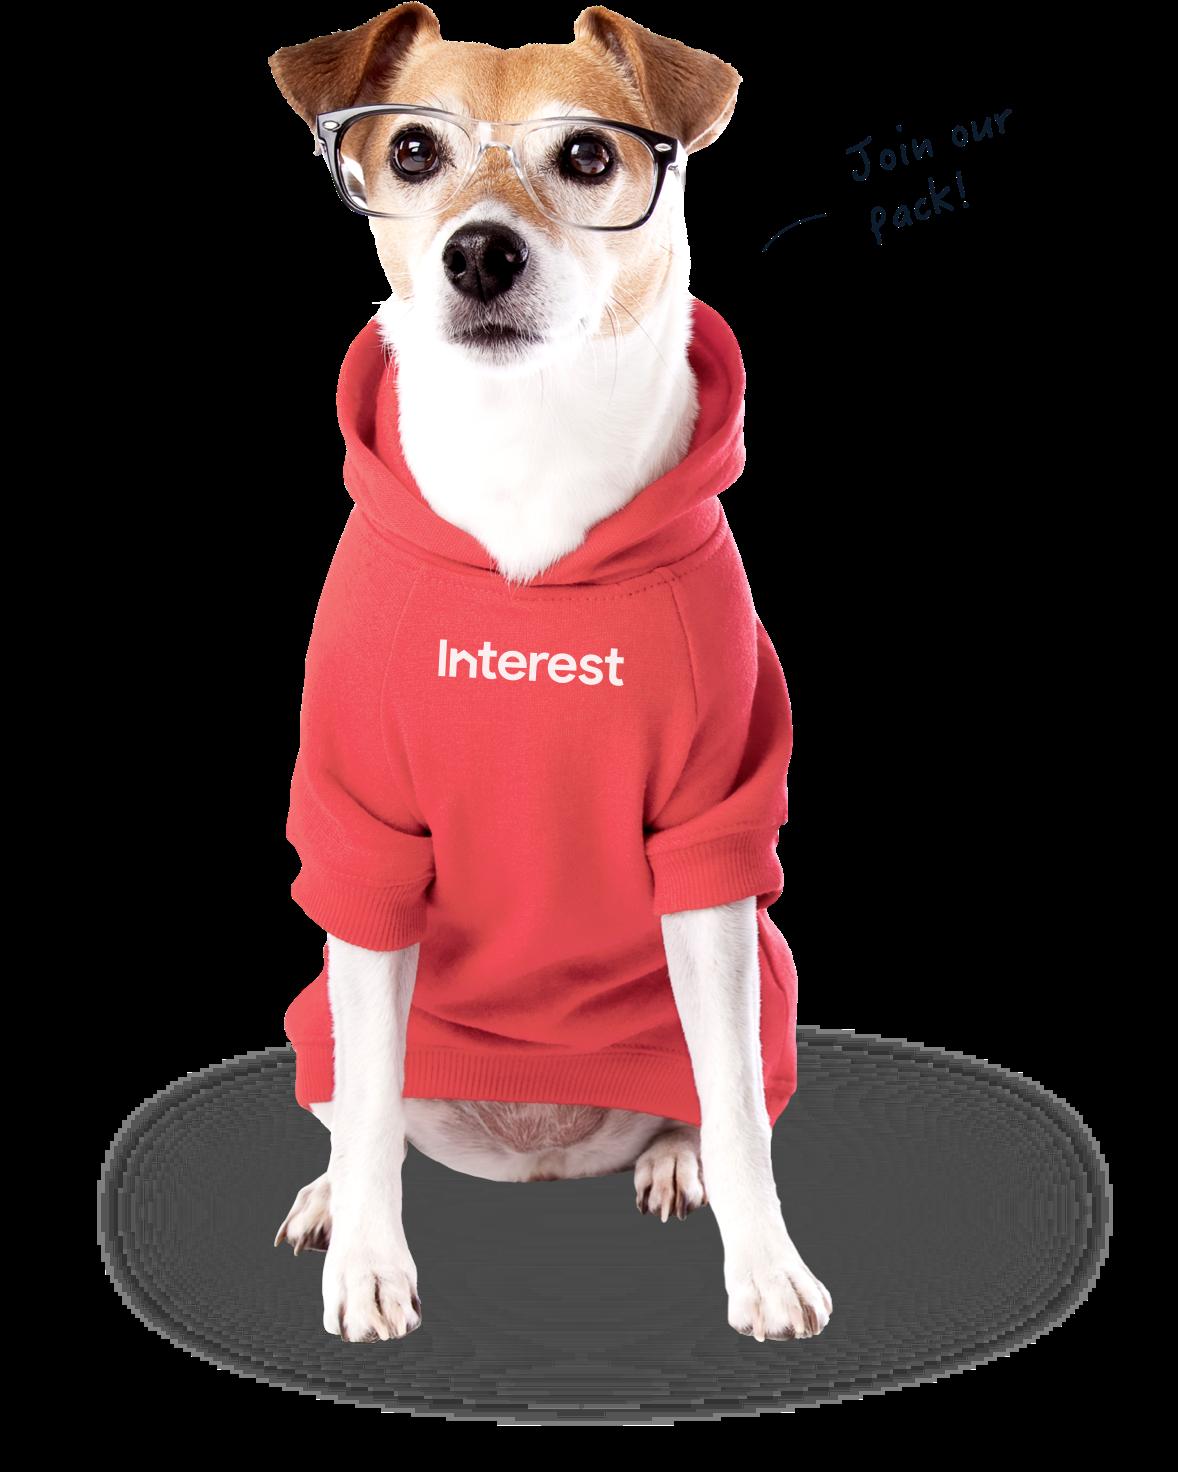 Dog wearing interest hoodie